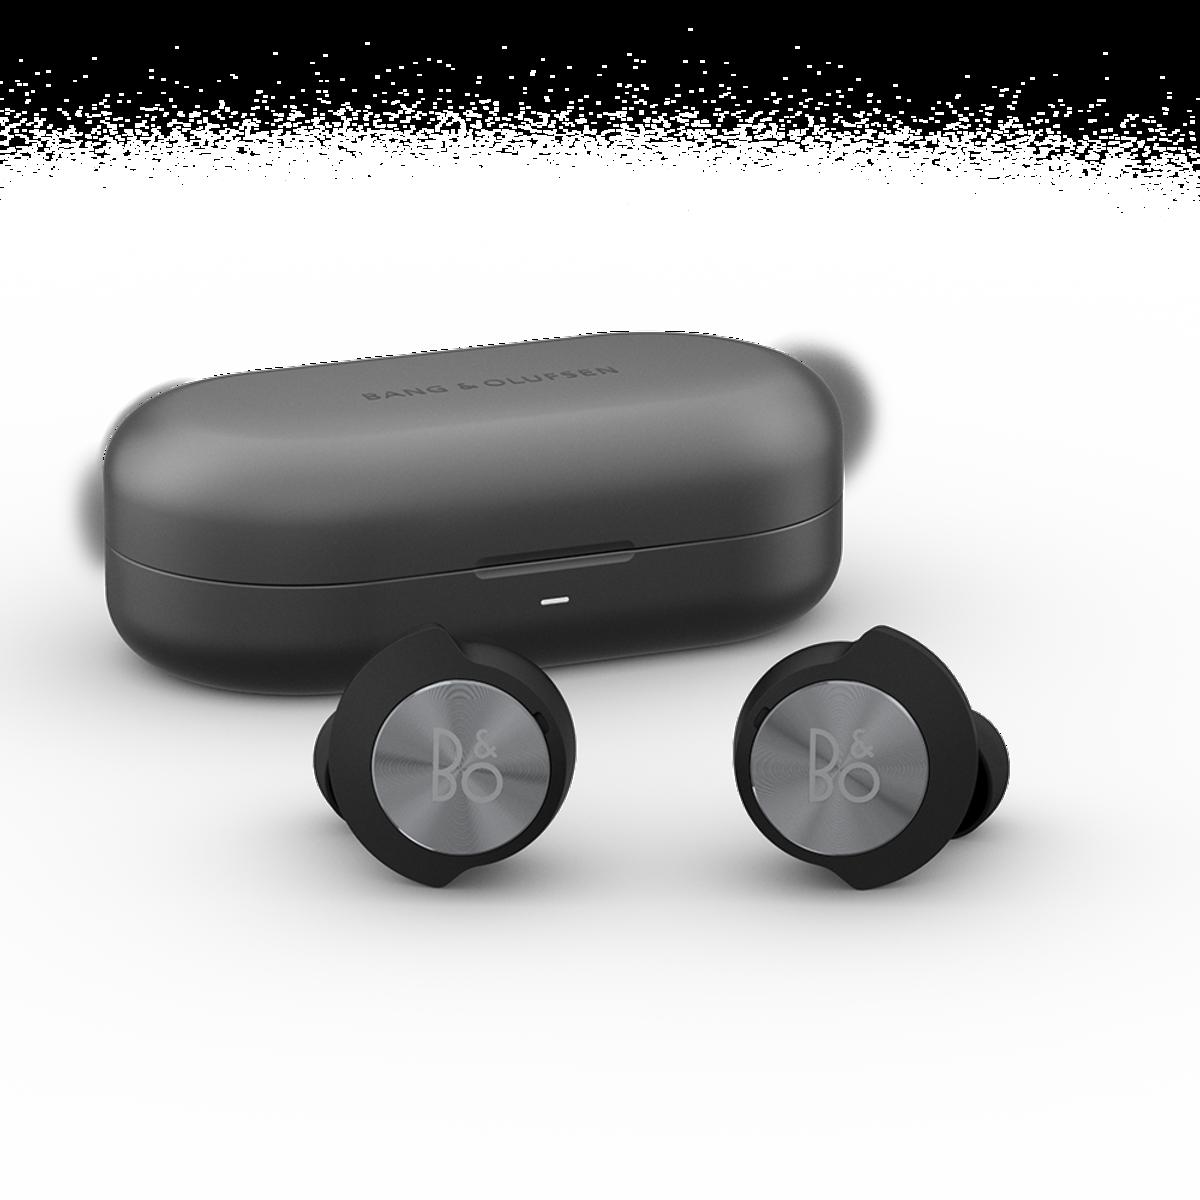 BeoPlay EQ Black earphones